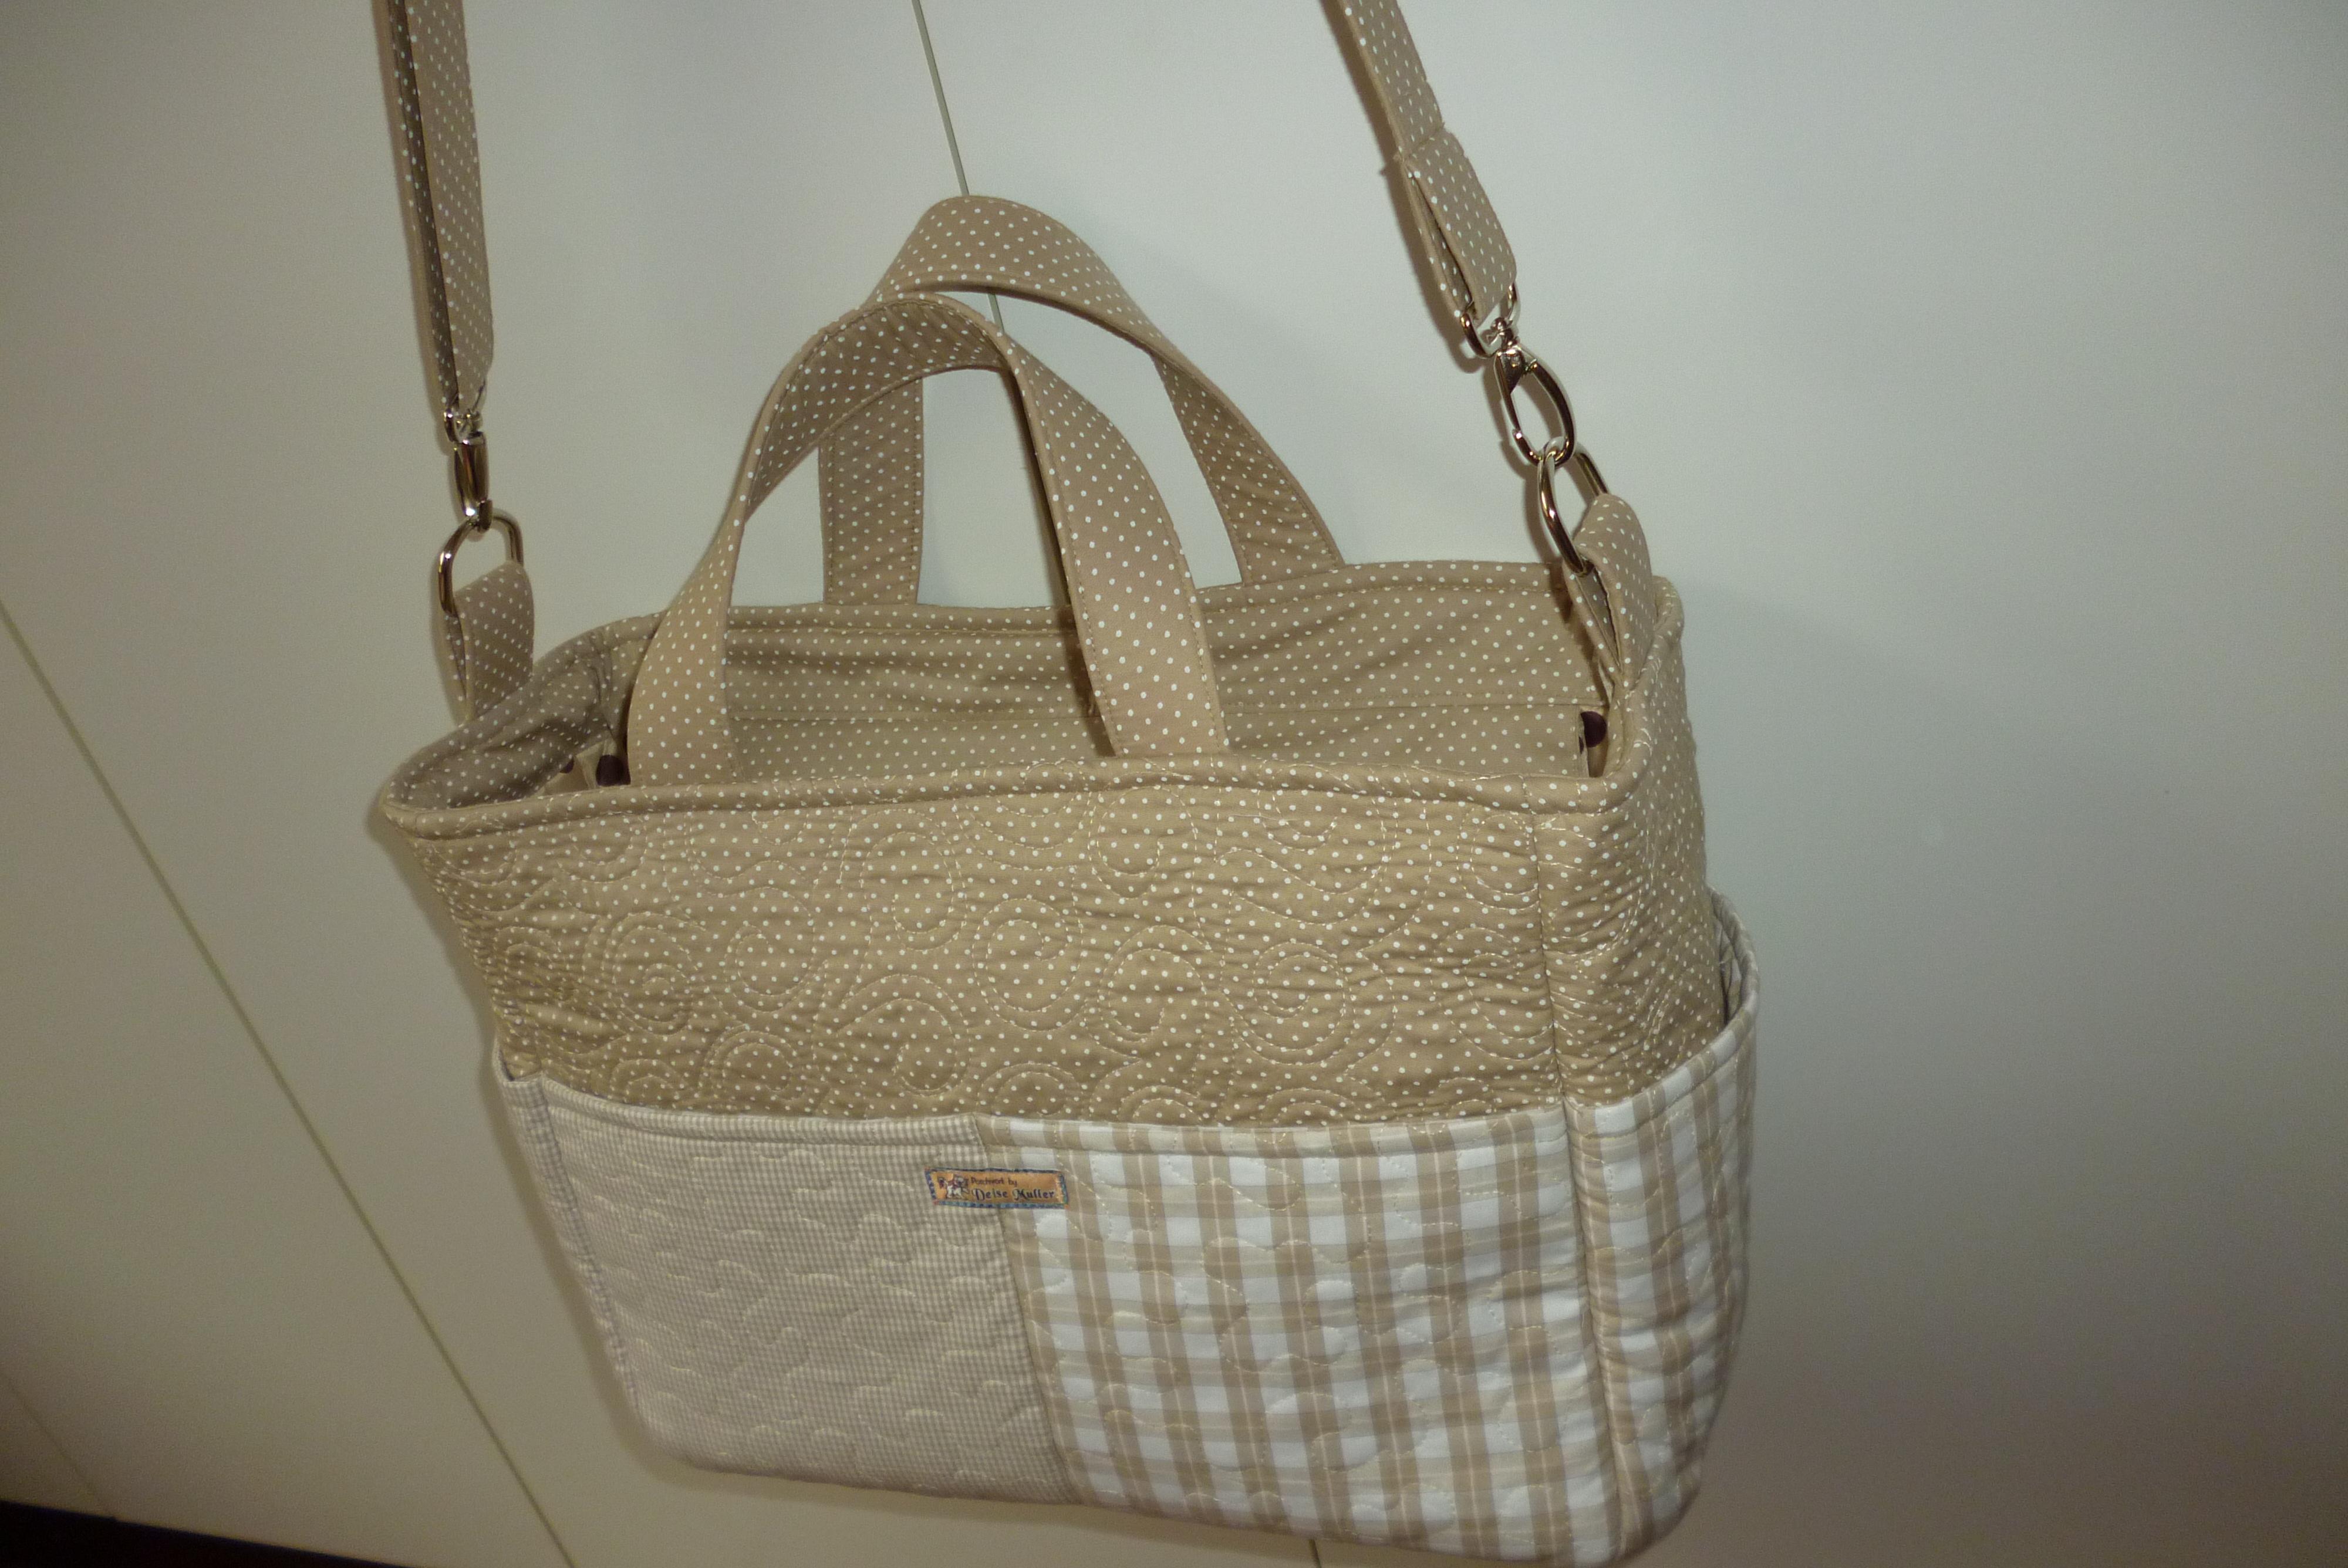 Bolsa De Tecido Bebe : Projeto bolsa para beb? patchwork by deise muller elo